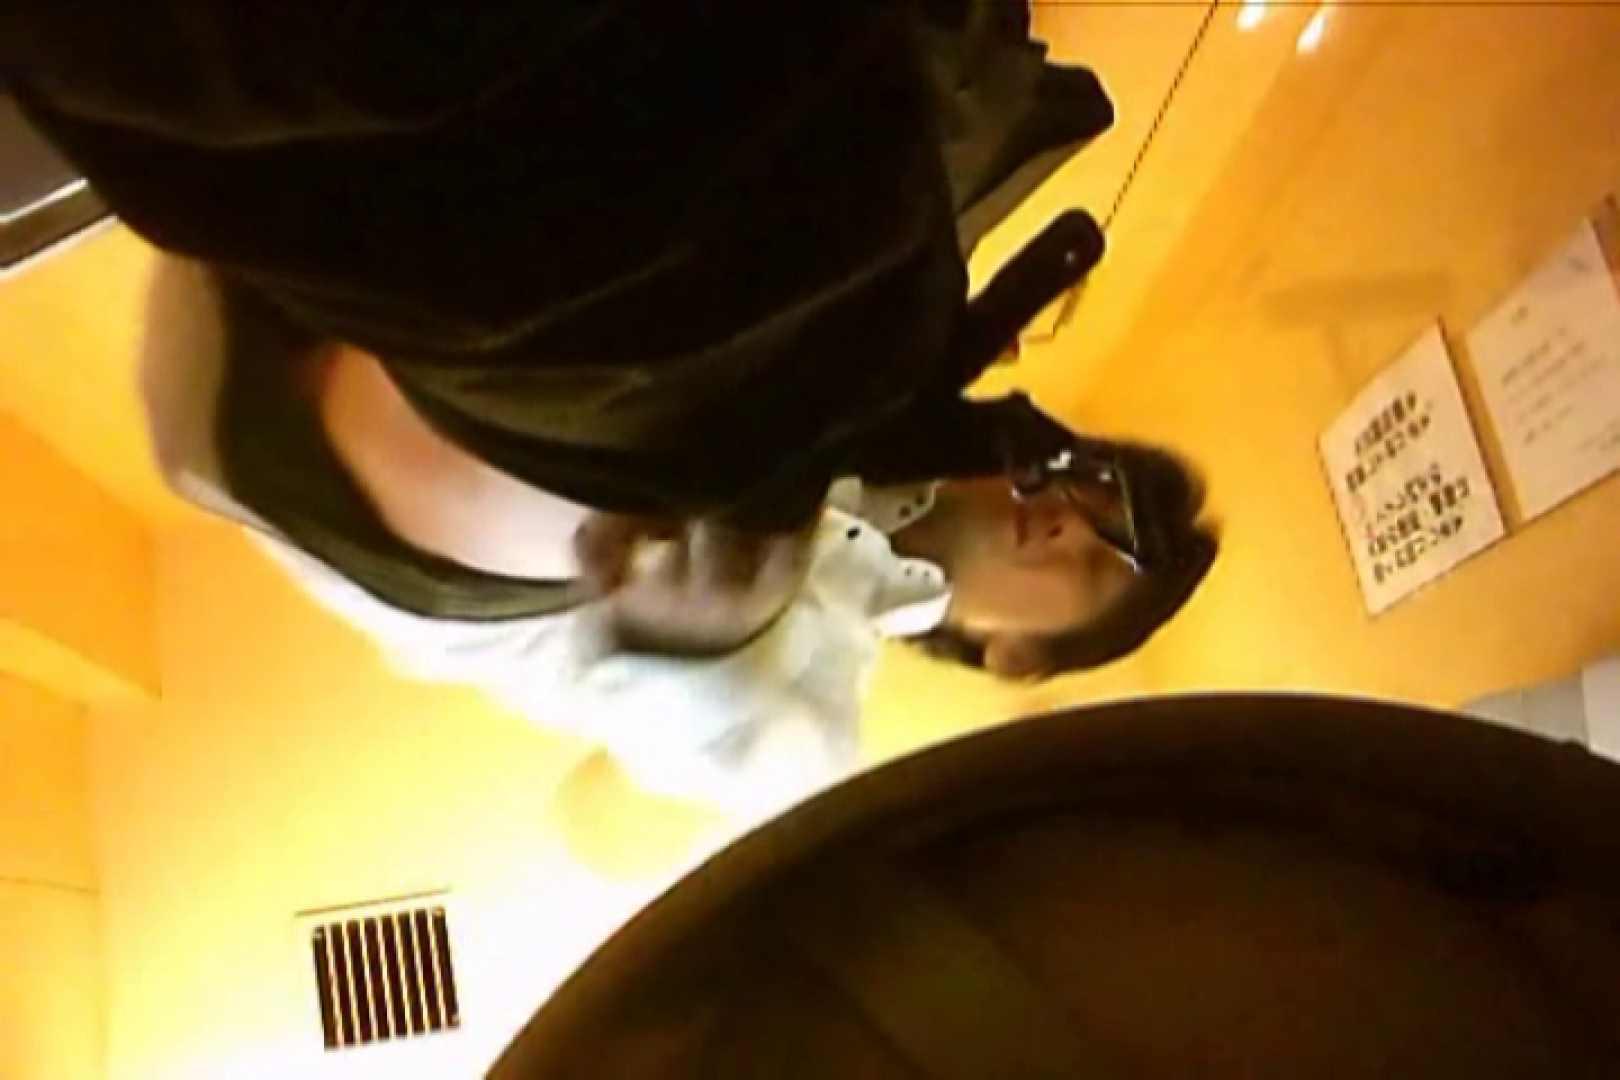 SEASON 2ND!掴み取りさんの洗面所覗き!in新幹線!VOL.03 人気シリーズ ゲイ射精画像 84連発 25